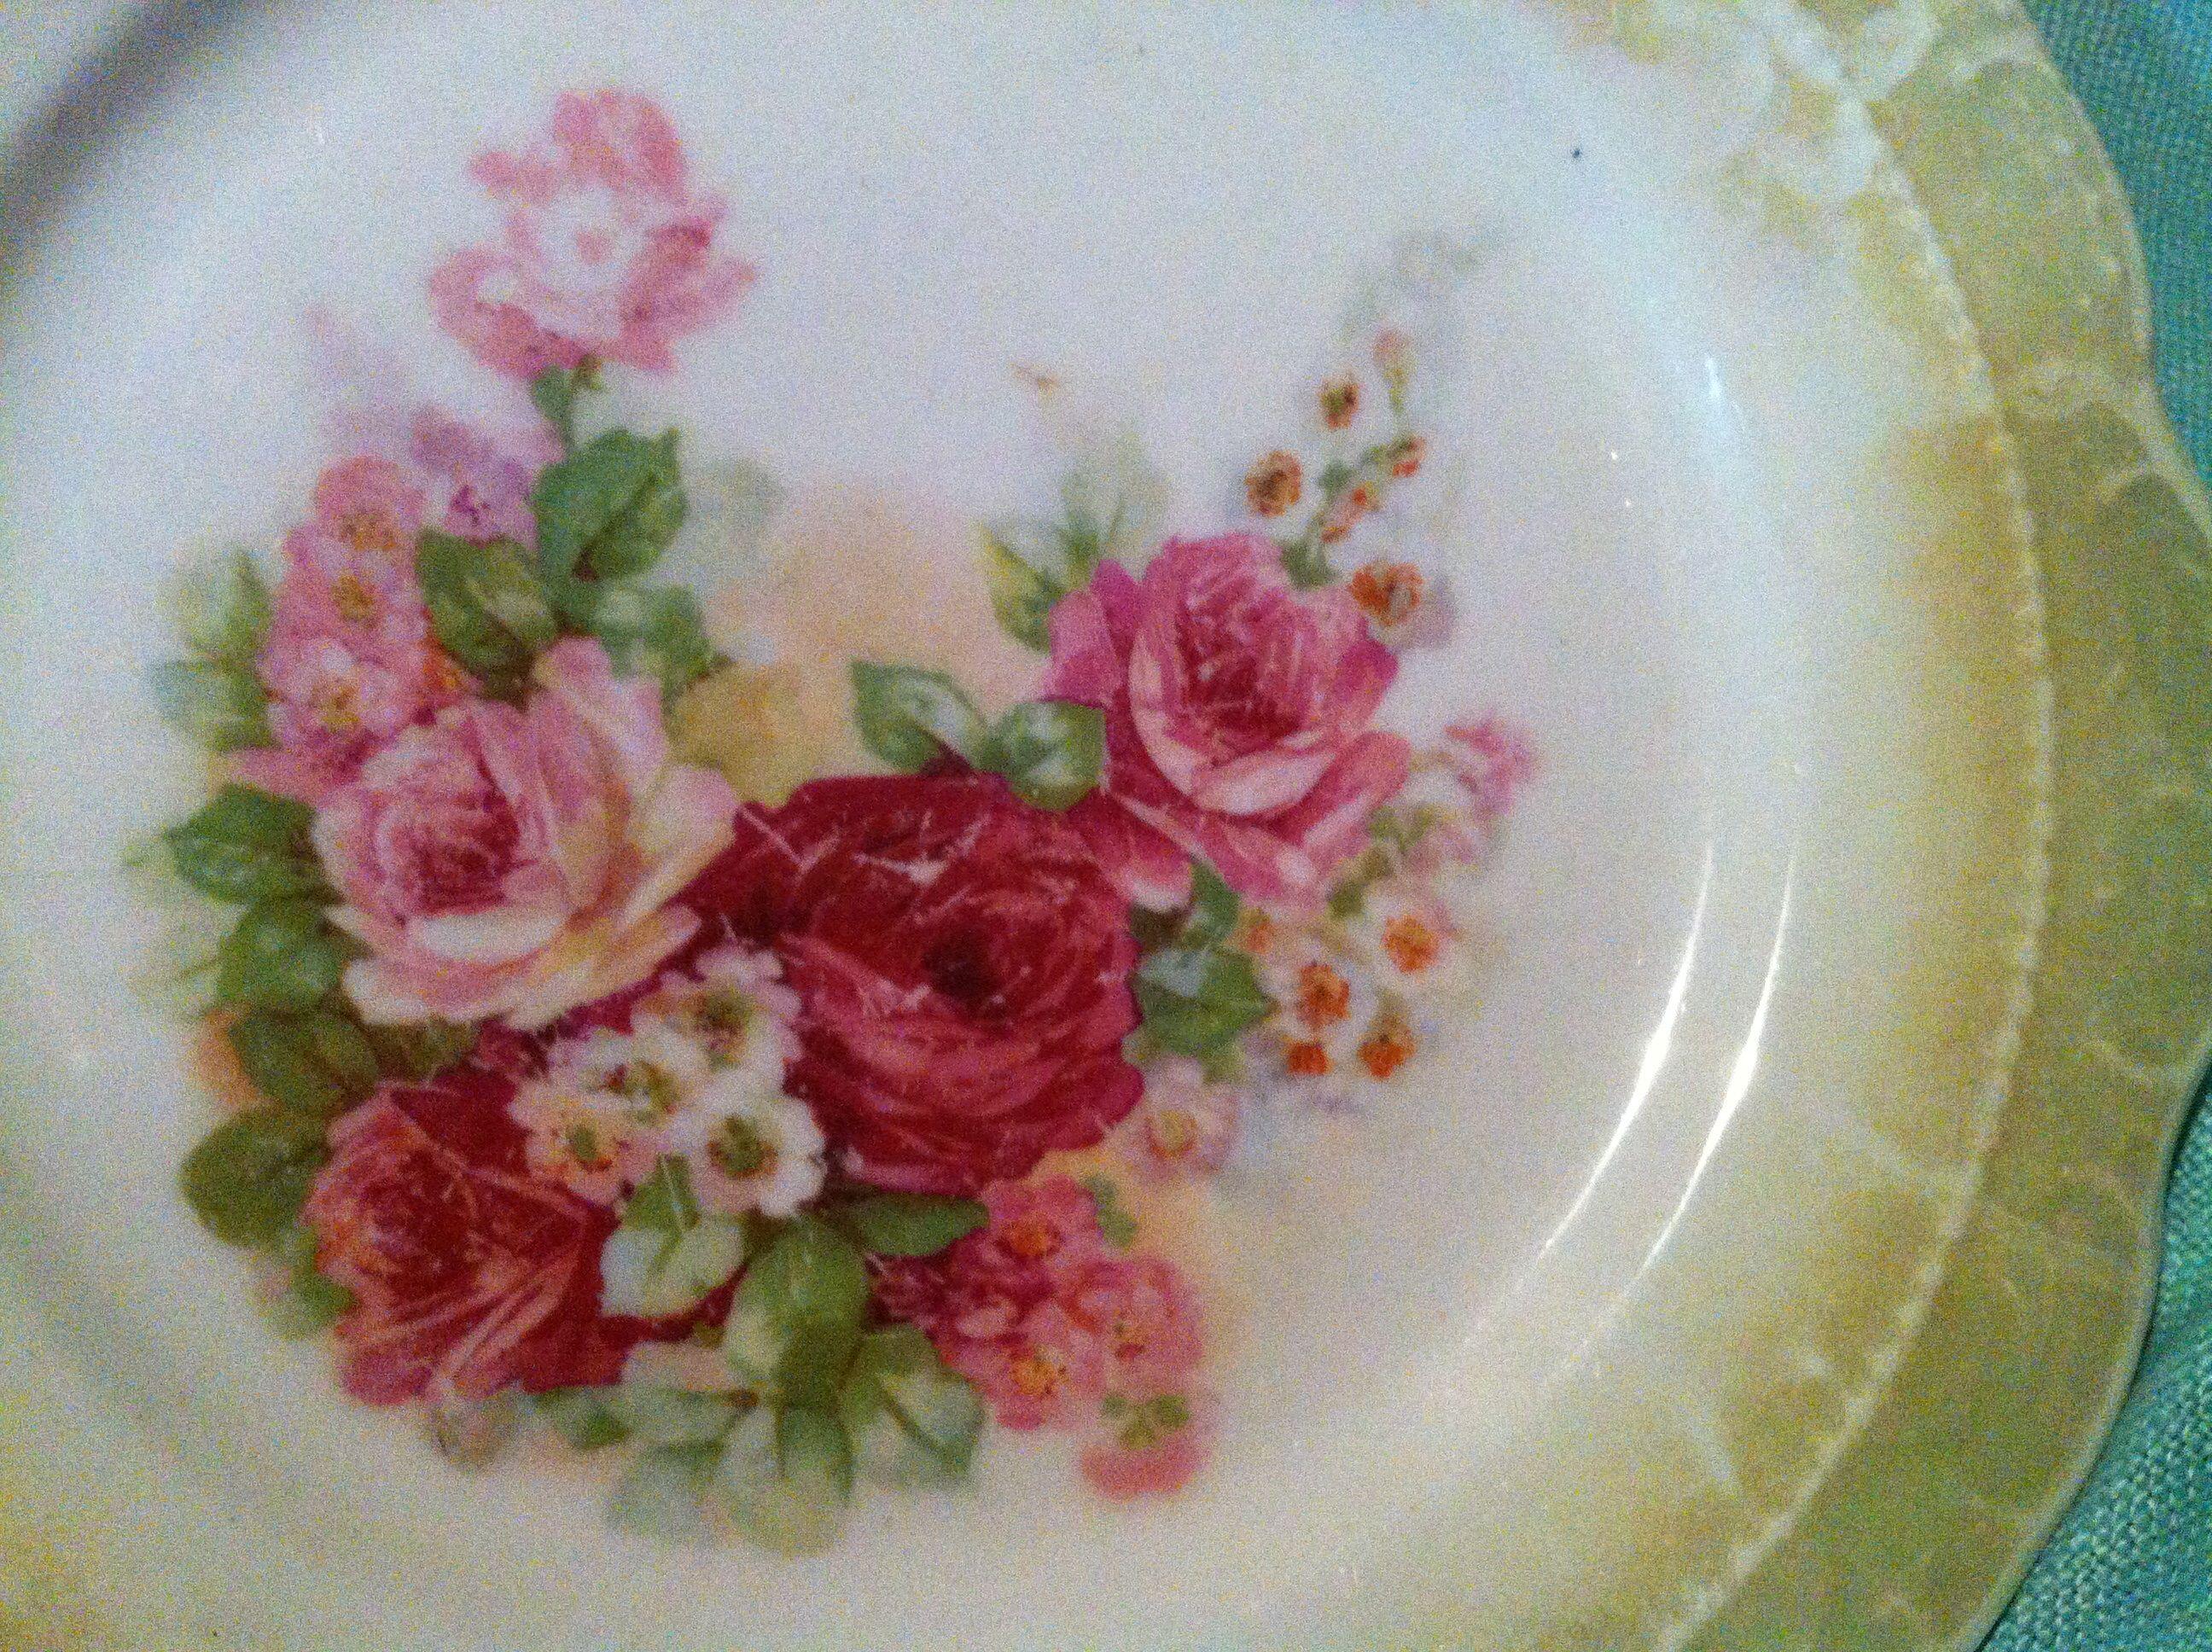 Transferware flowers on a saucer.